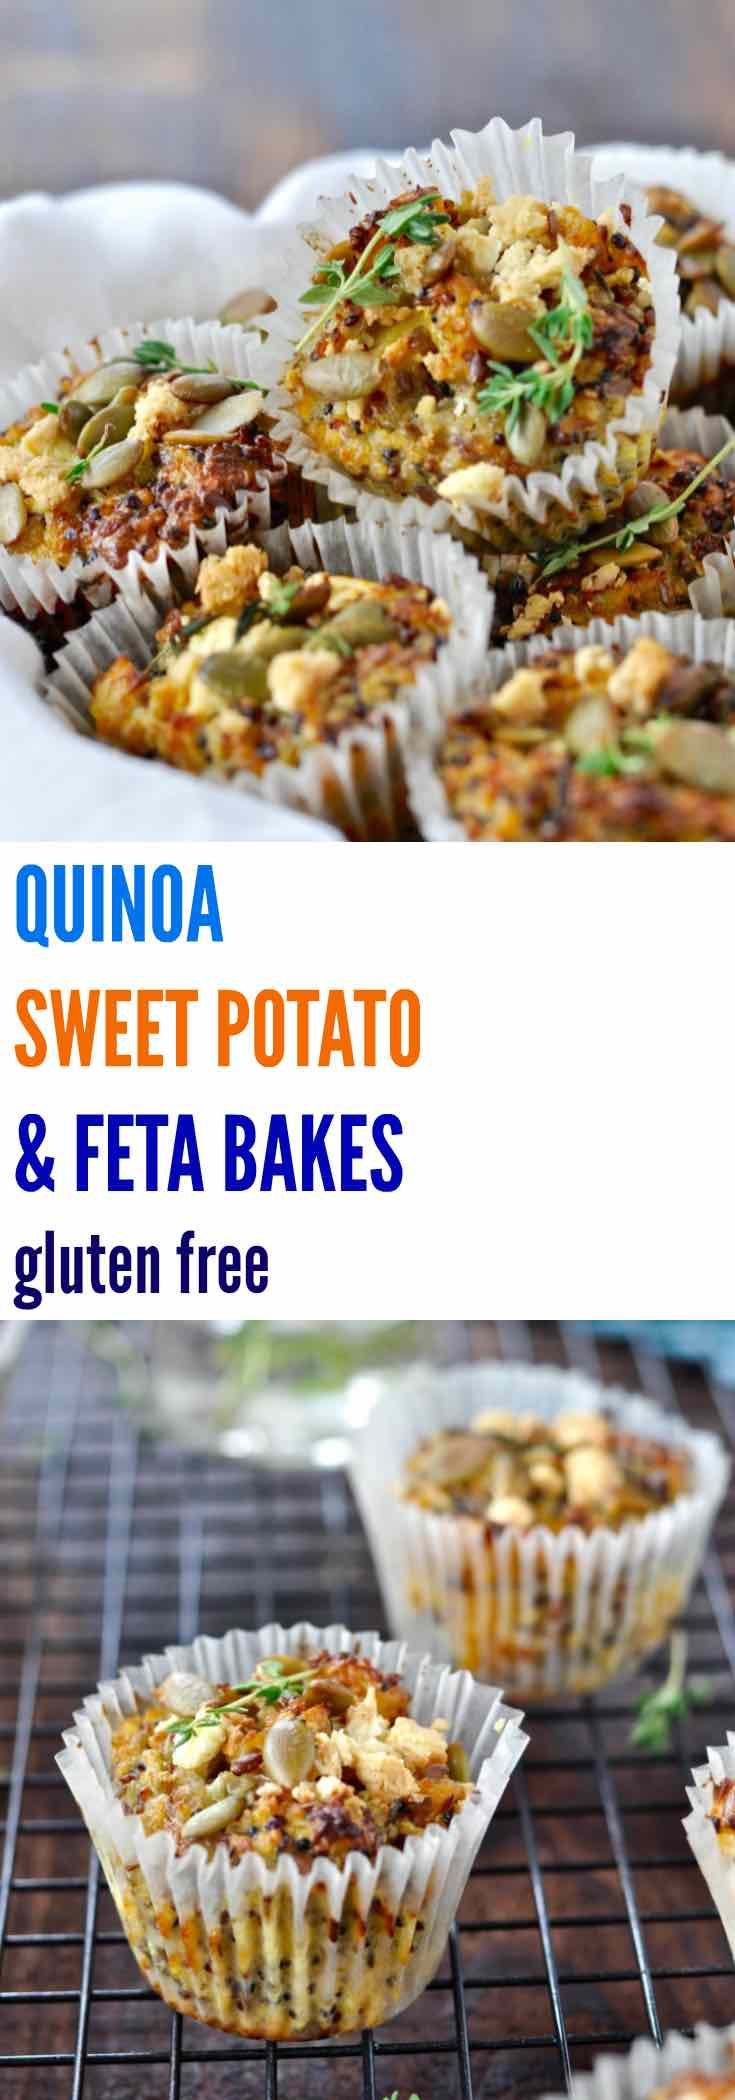 These healthy QUINOA, SWEET POTATO & FETA BAKES are gluten free and freeze…